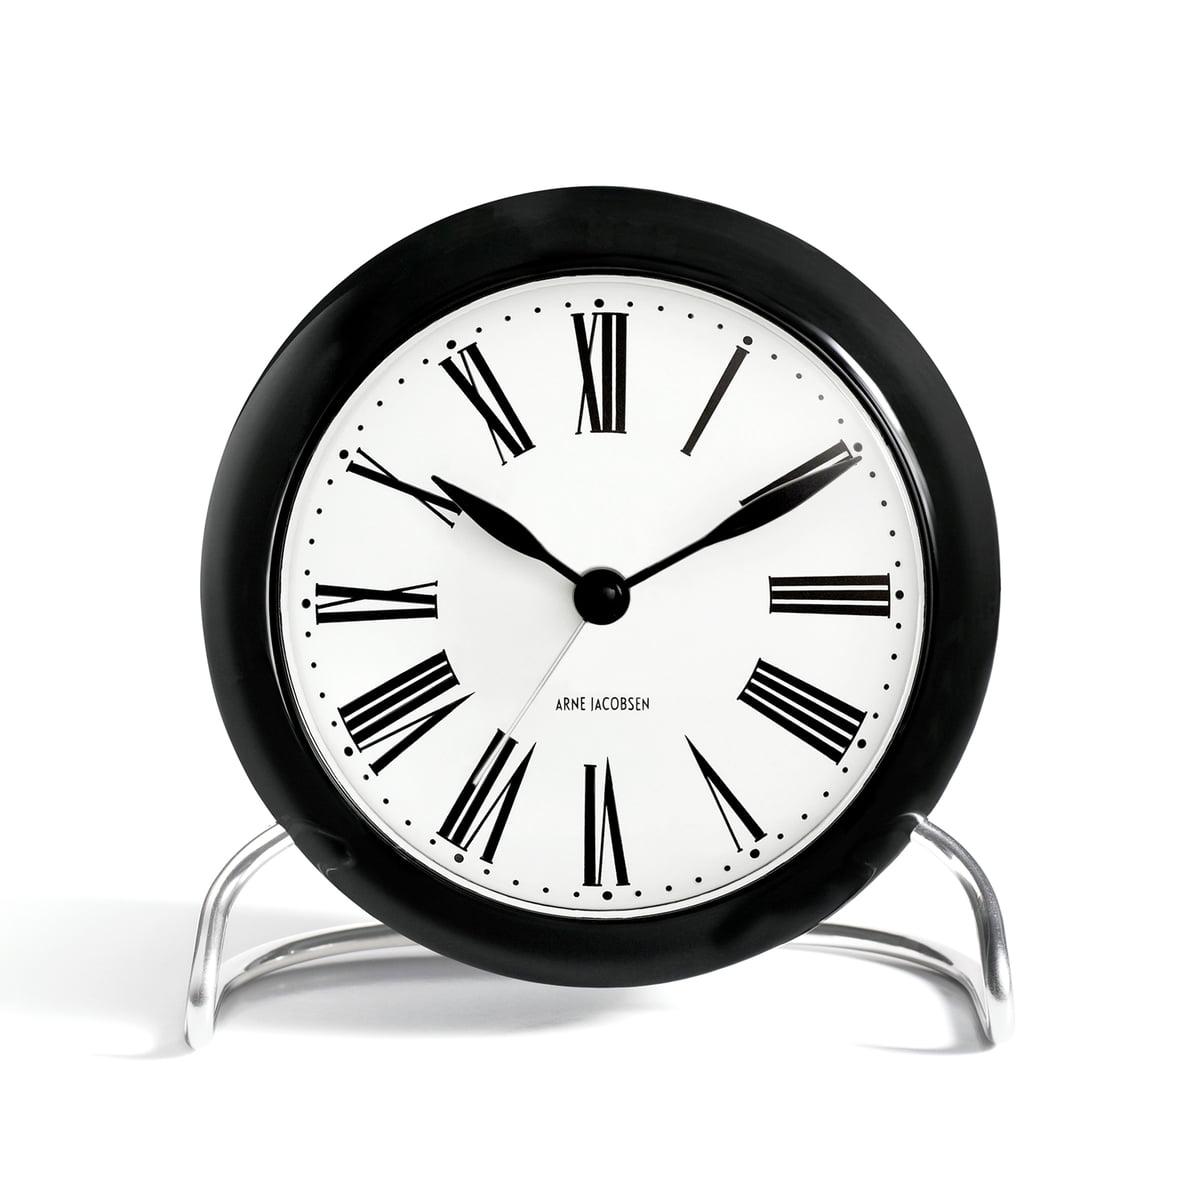 Rosendahl - AJ Roman Tischuhr mit Alarm, Ø 11 cm   Dekoration > Uhren > Standuhren   Weiß   Aluminium  glas (mineralglas)   Rosendahl